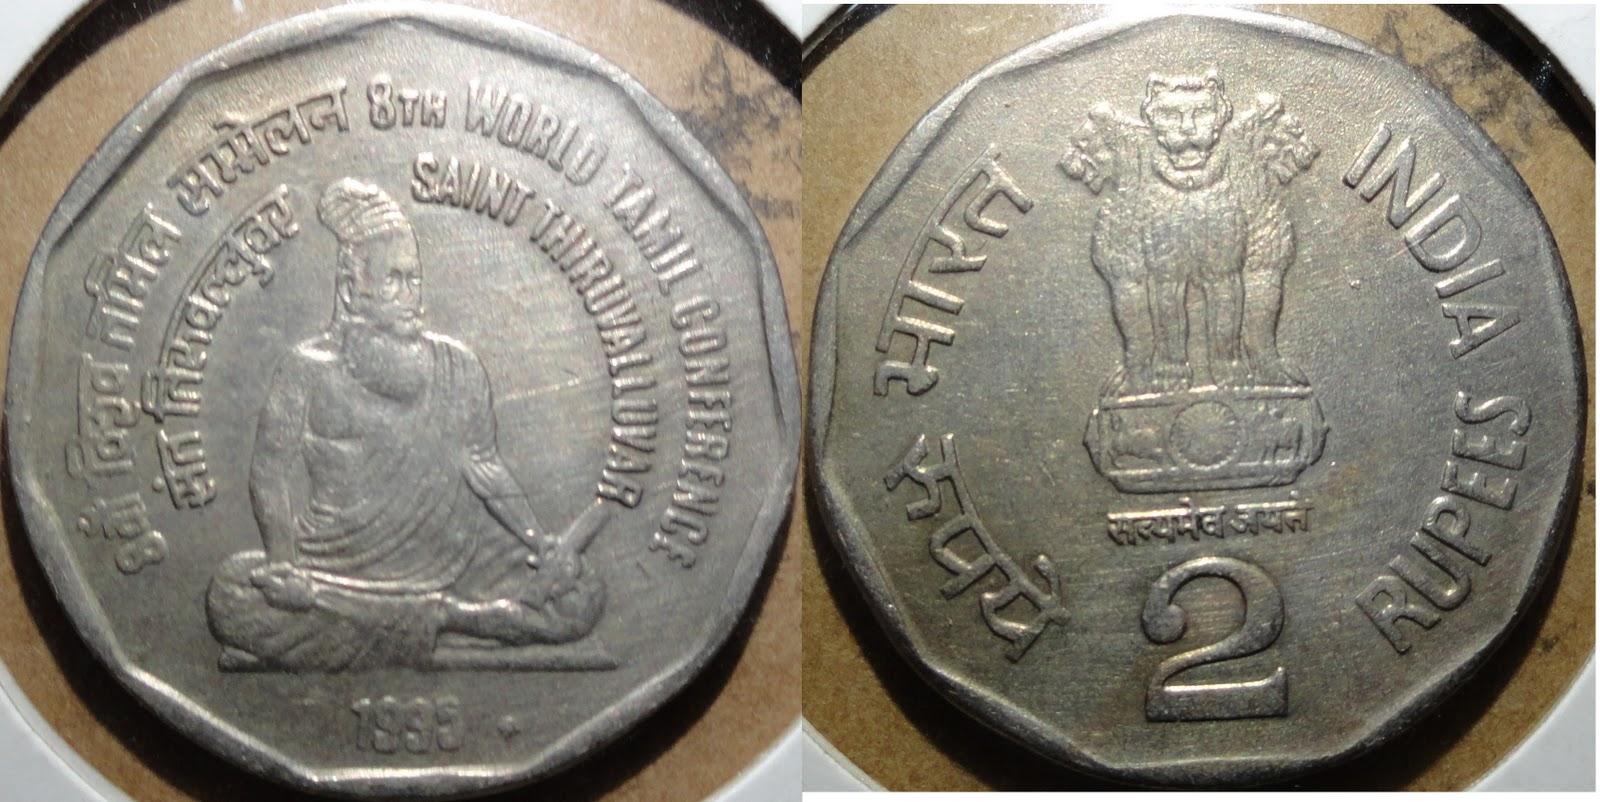 10 Gram Silver Coin Price In Delhi Today 10 Gram Silver